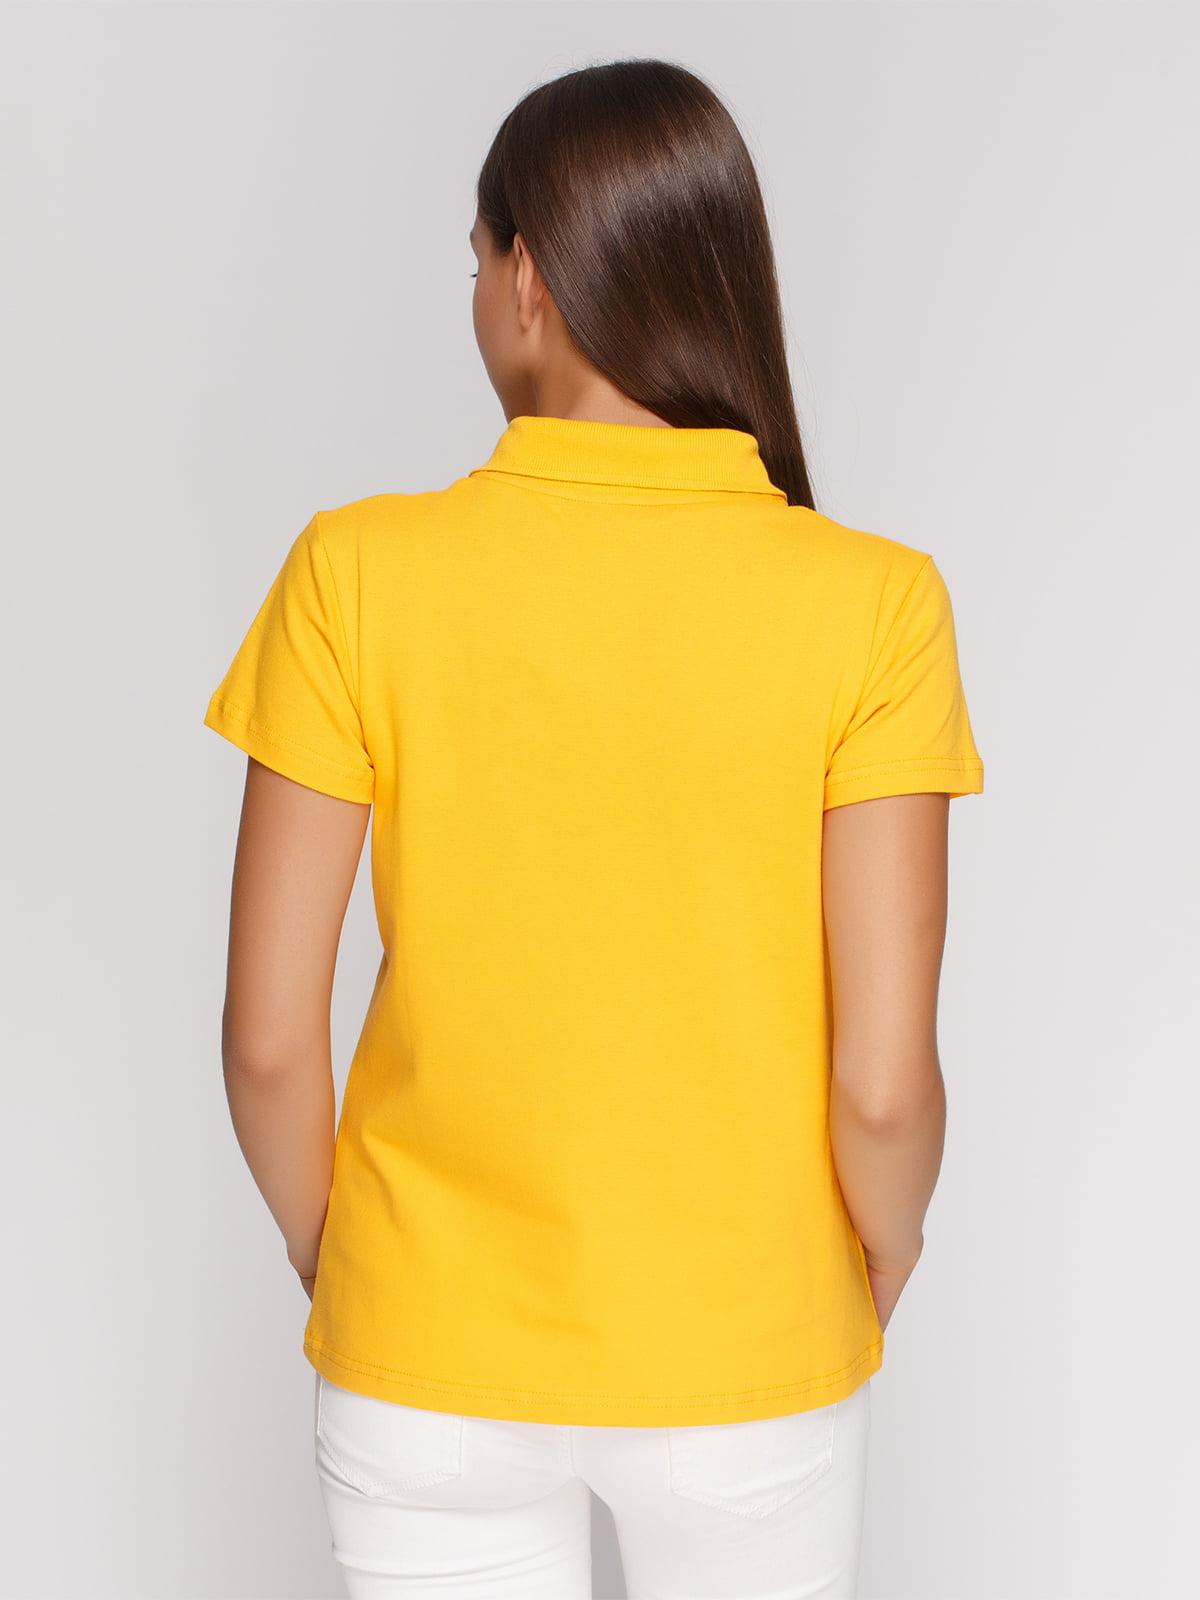 Футболка-поло жовта з принтом | 4578491 | фото 2